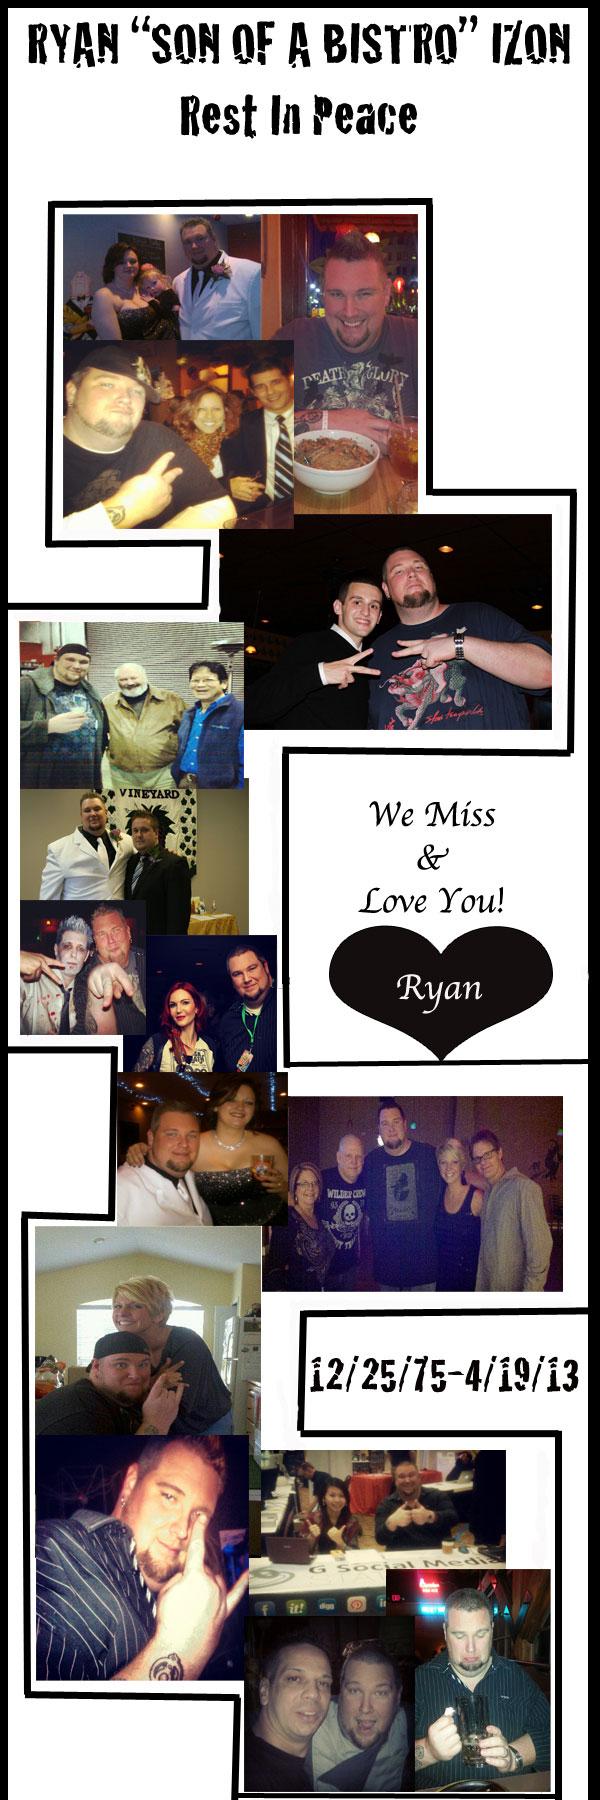 Ryan Izon - Son of a Bistro - Rest in Peace 12/25/75 - 4/19/13